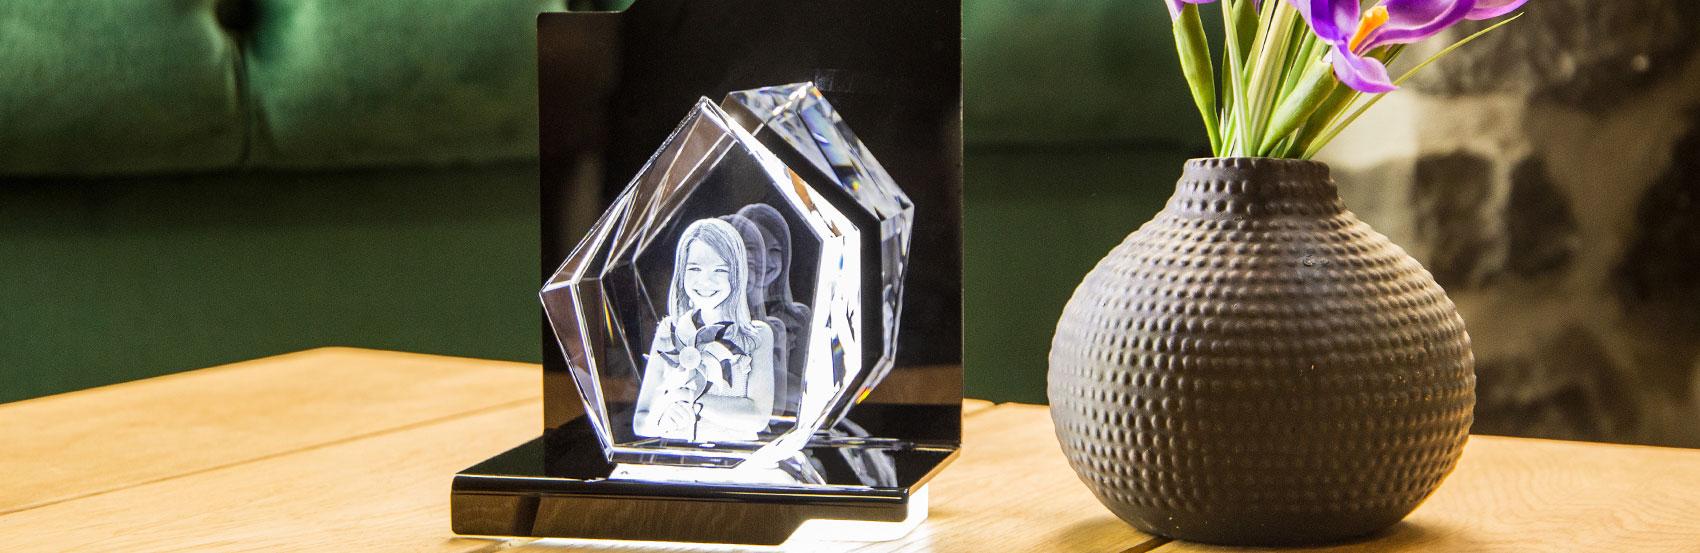 Looxis 3d Glasbild auf sockel bei photoimaging